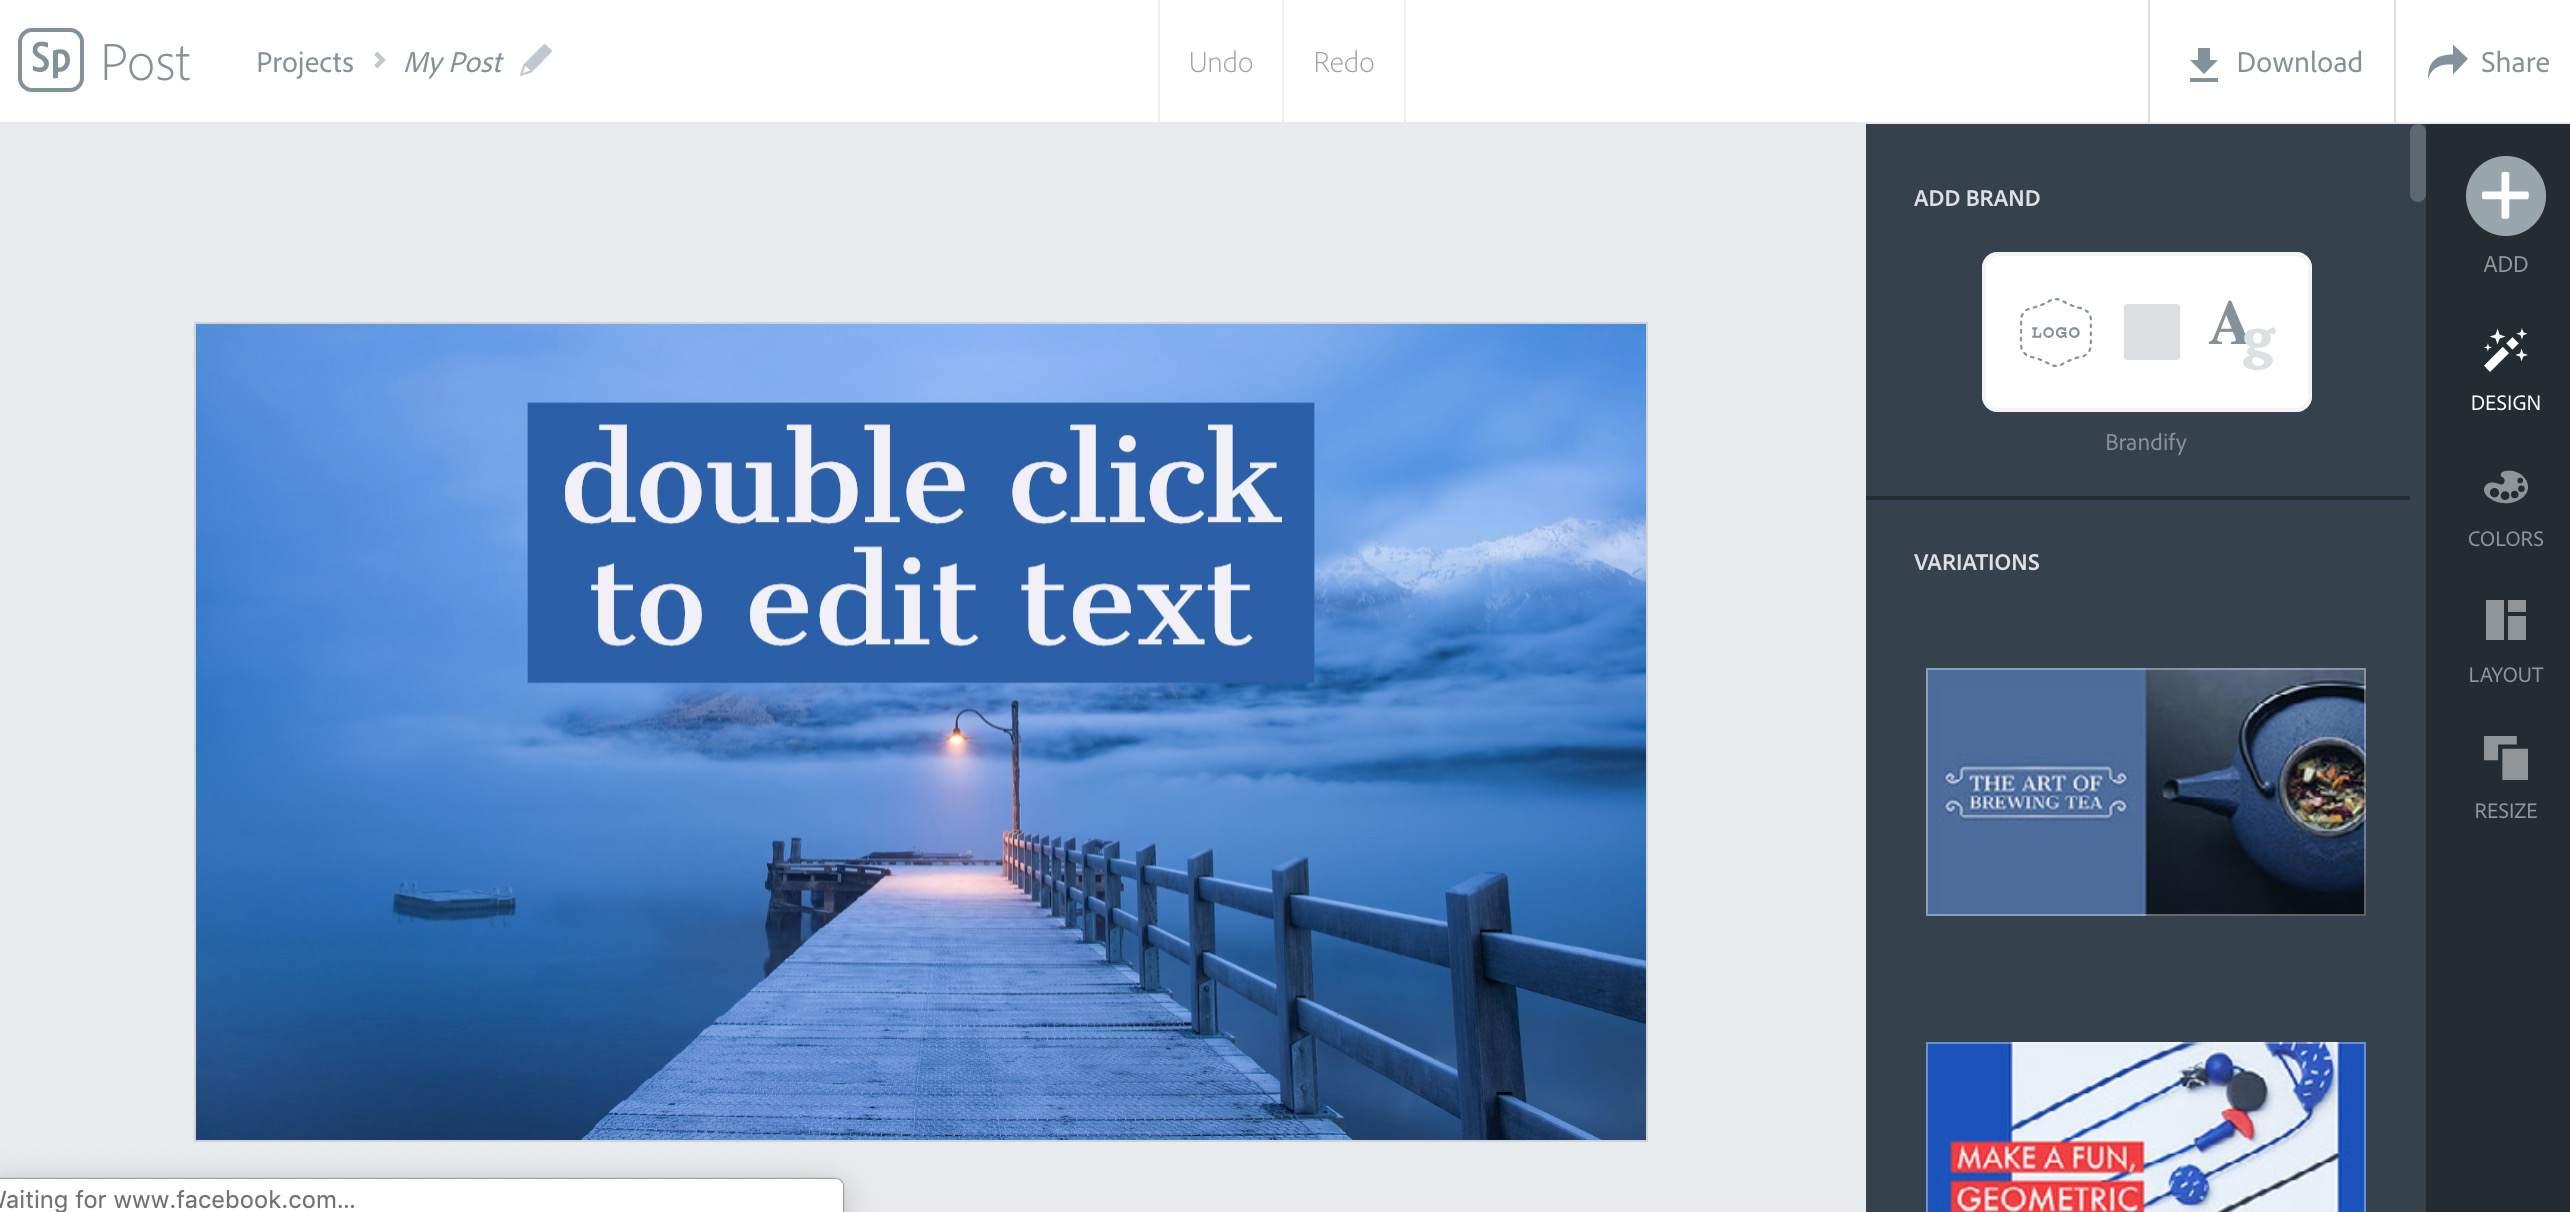 Adobe Spark website